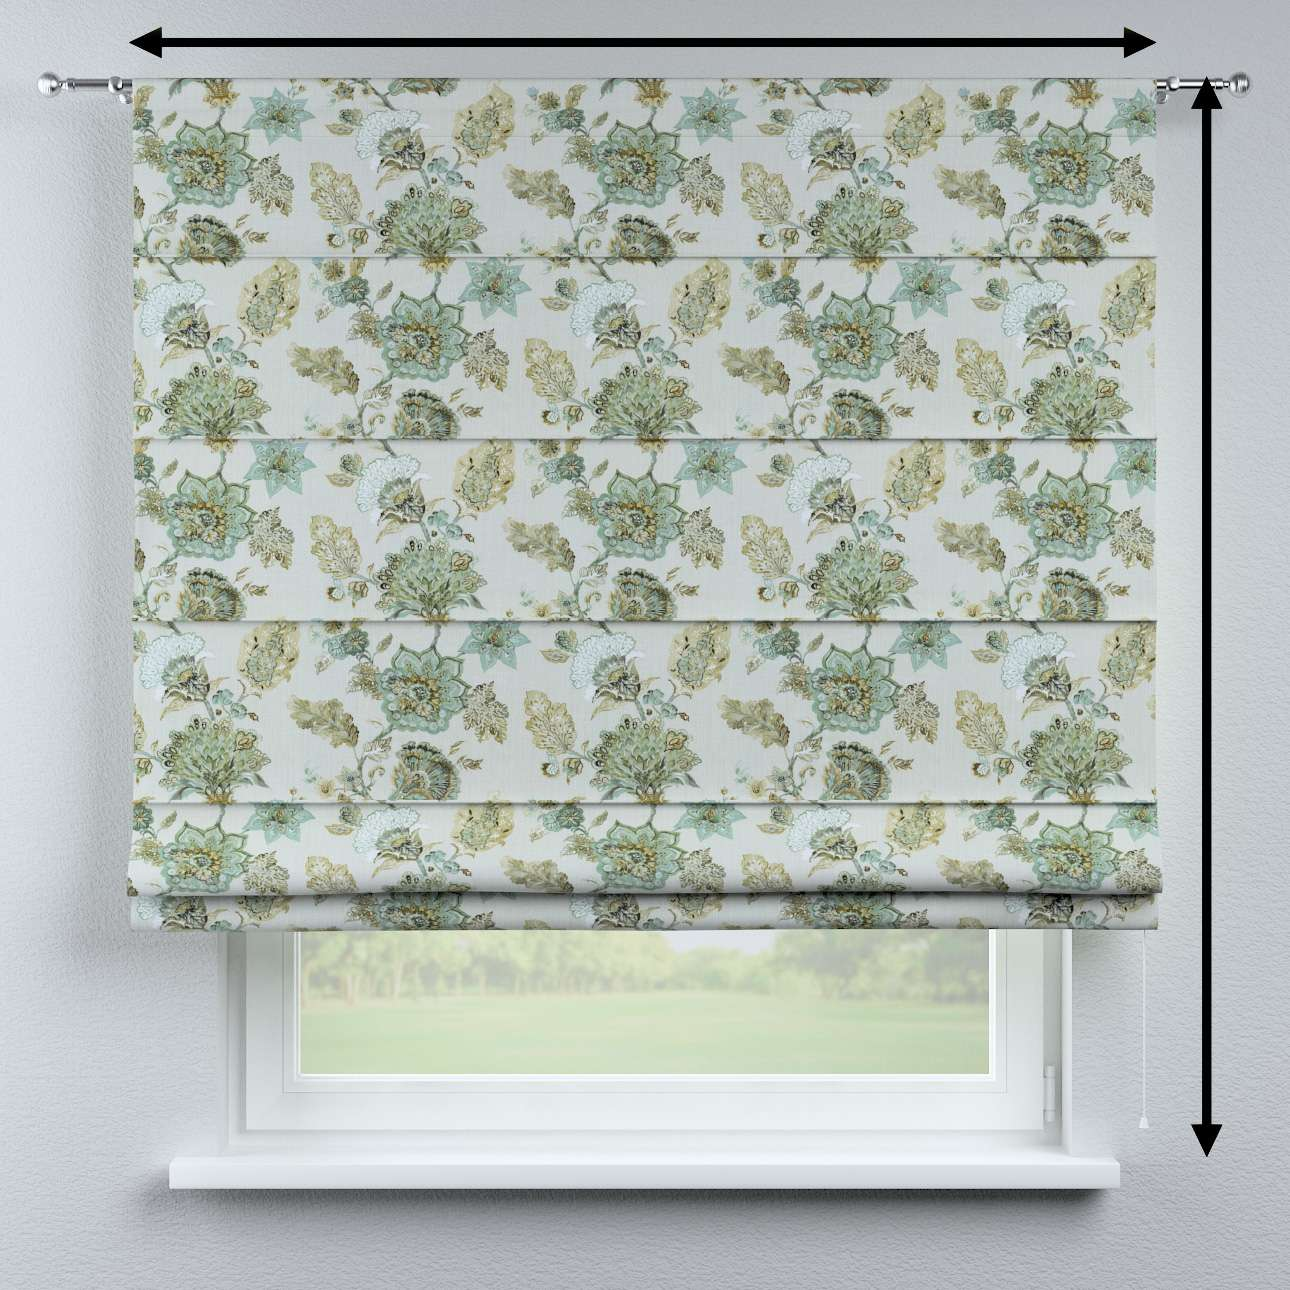 Rímska roleta Torino V kolekcii Flowers, tkanina: 143-67